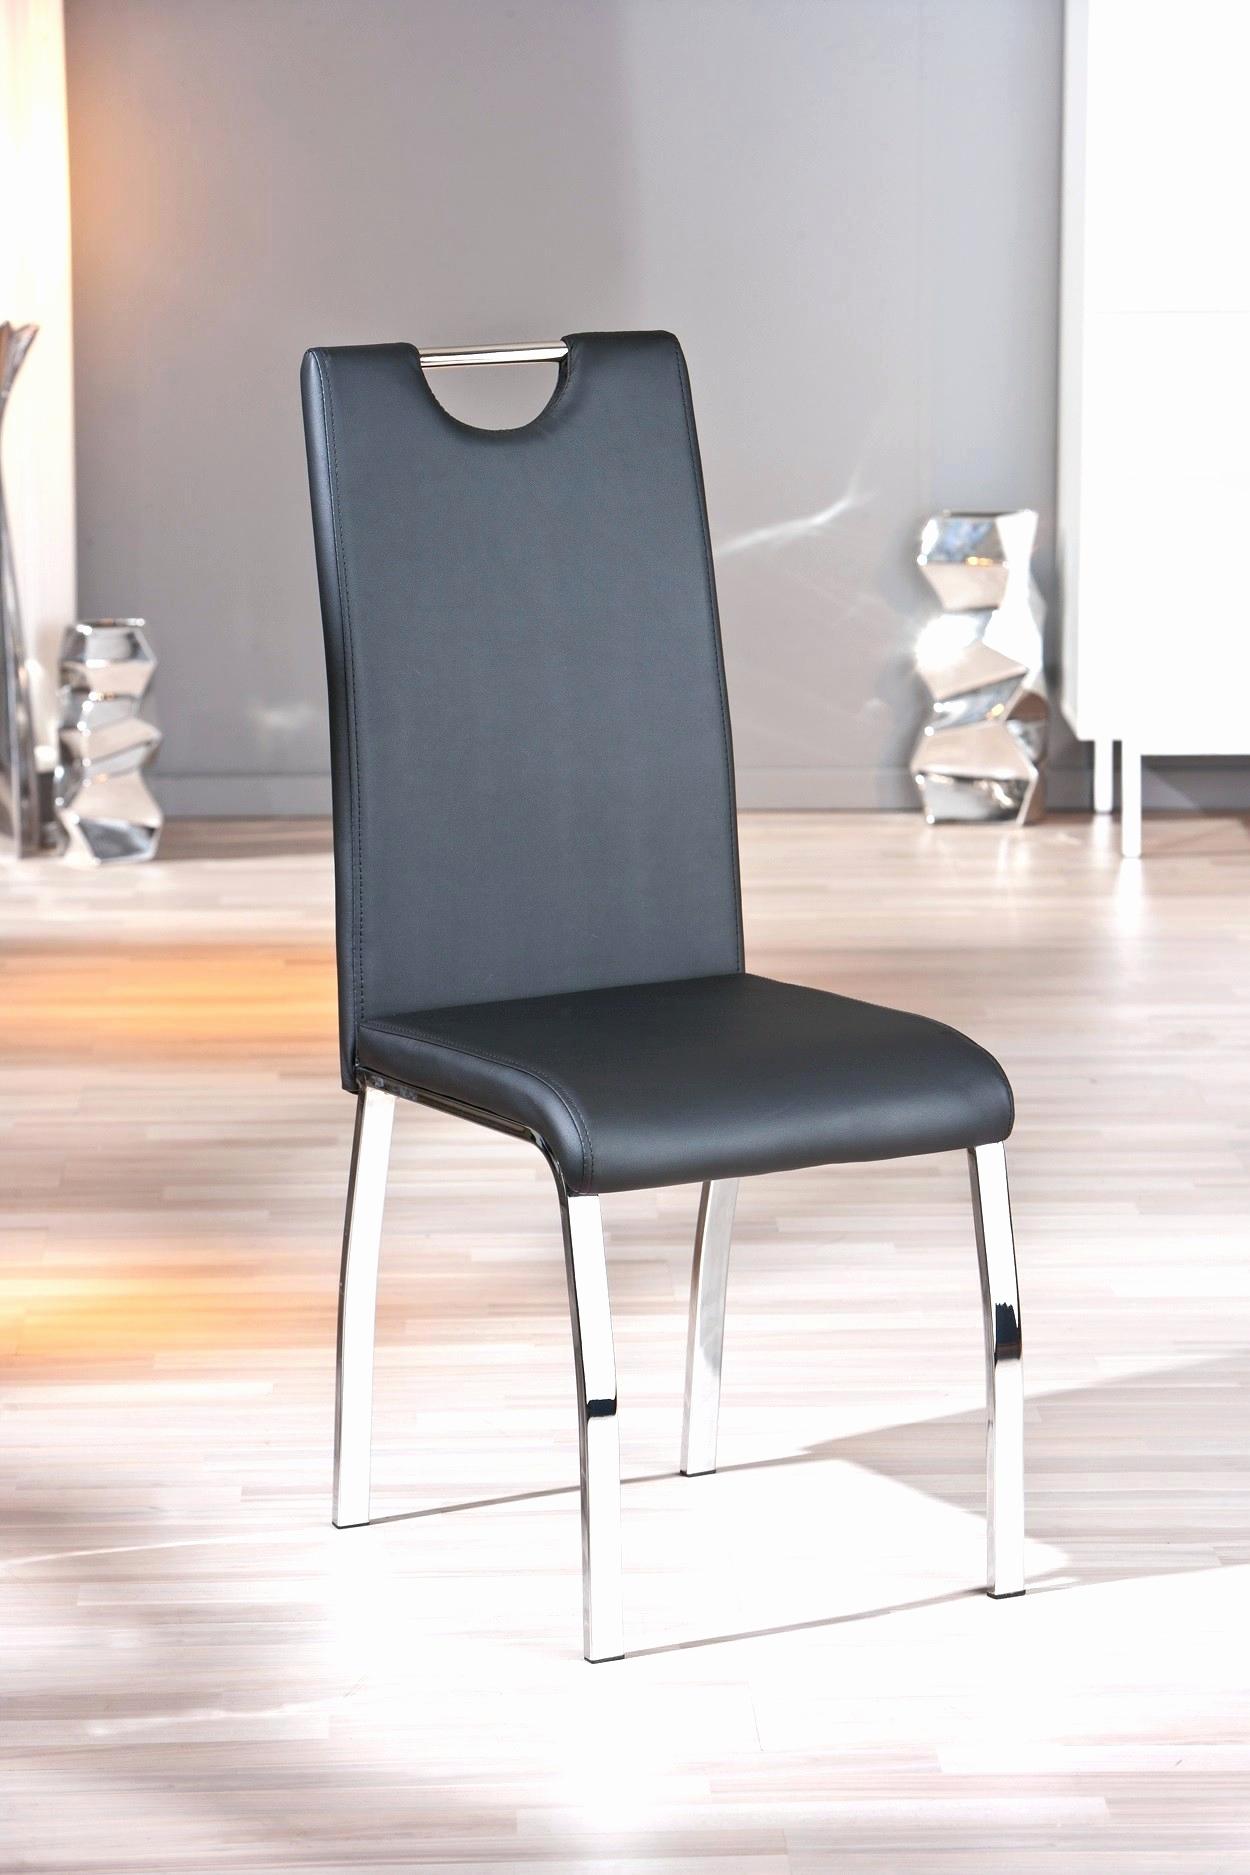 Gifi Chaise Charlotte Frais Images Chaise Charlotte Gifi Design De Maison Chaise Charlotte I Chaise